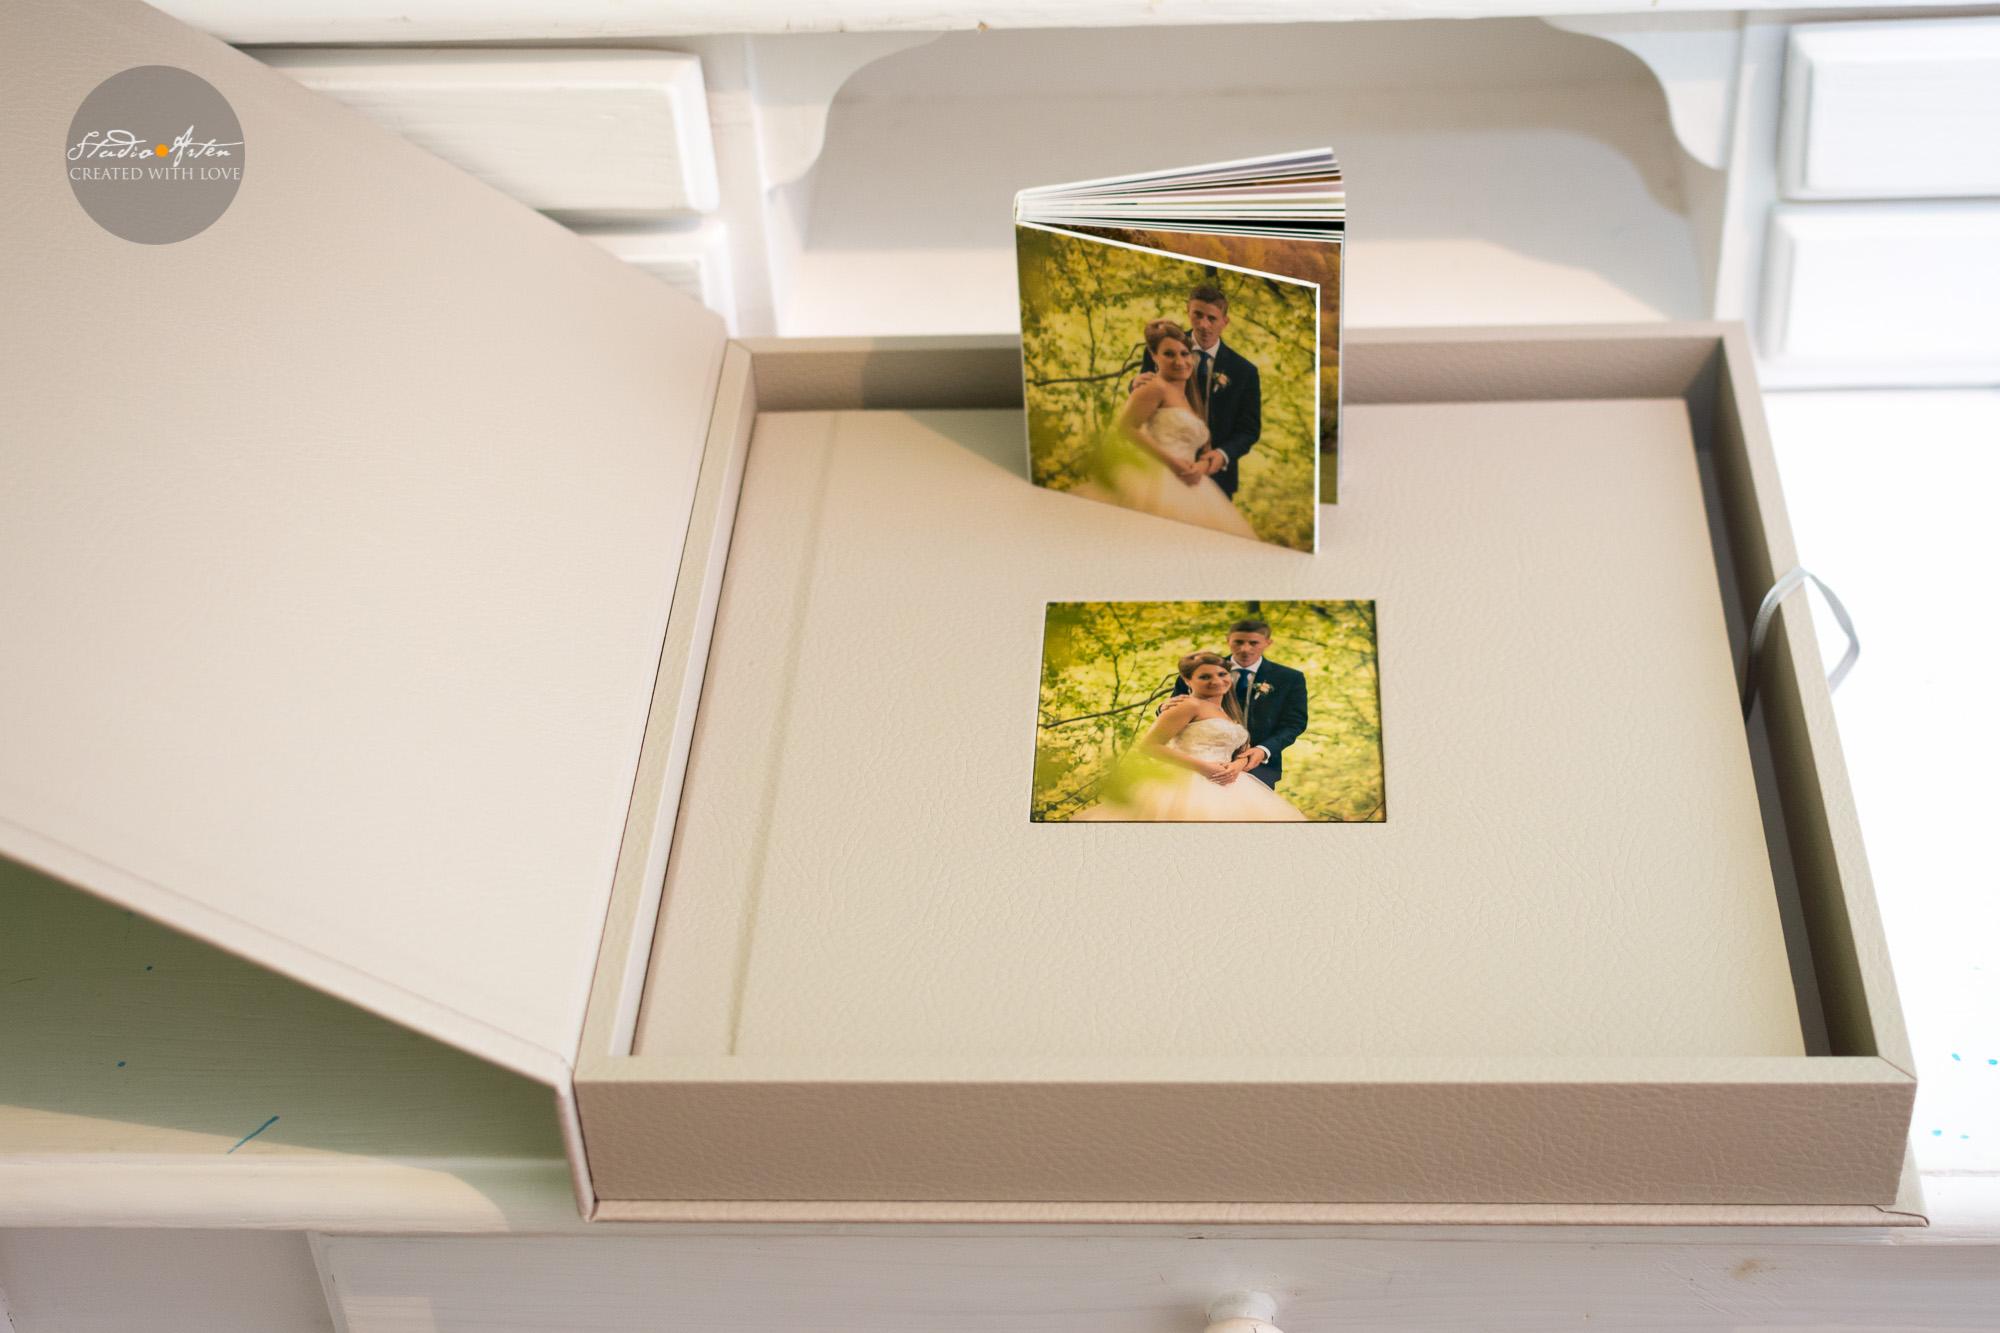 album nunta, fotografii nunta, fotograf profesionist nunta mures, coperta personalizata, piele ecologica, cutie personalizata, amintirile tale, album de nunta digital,